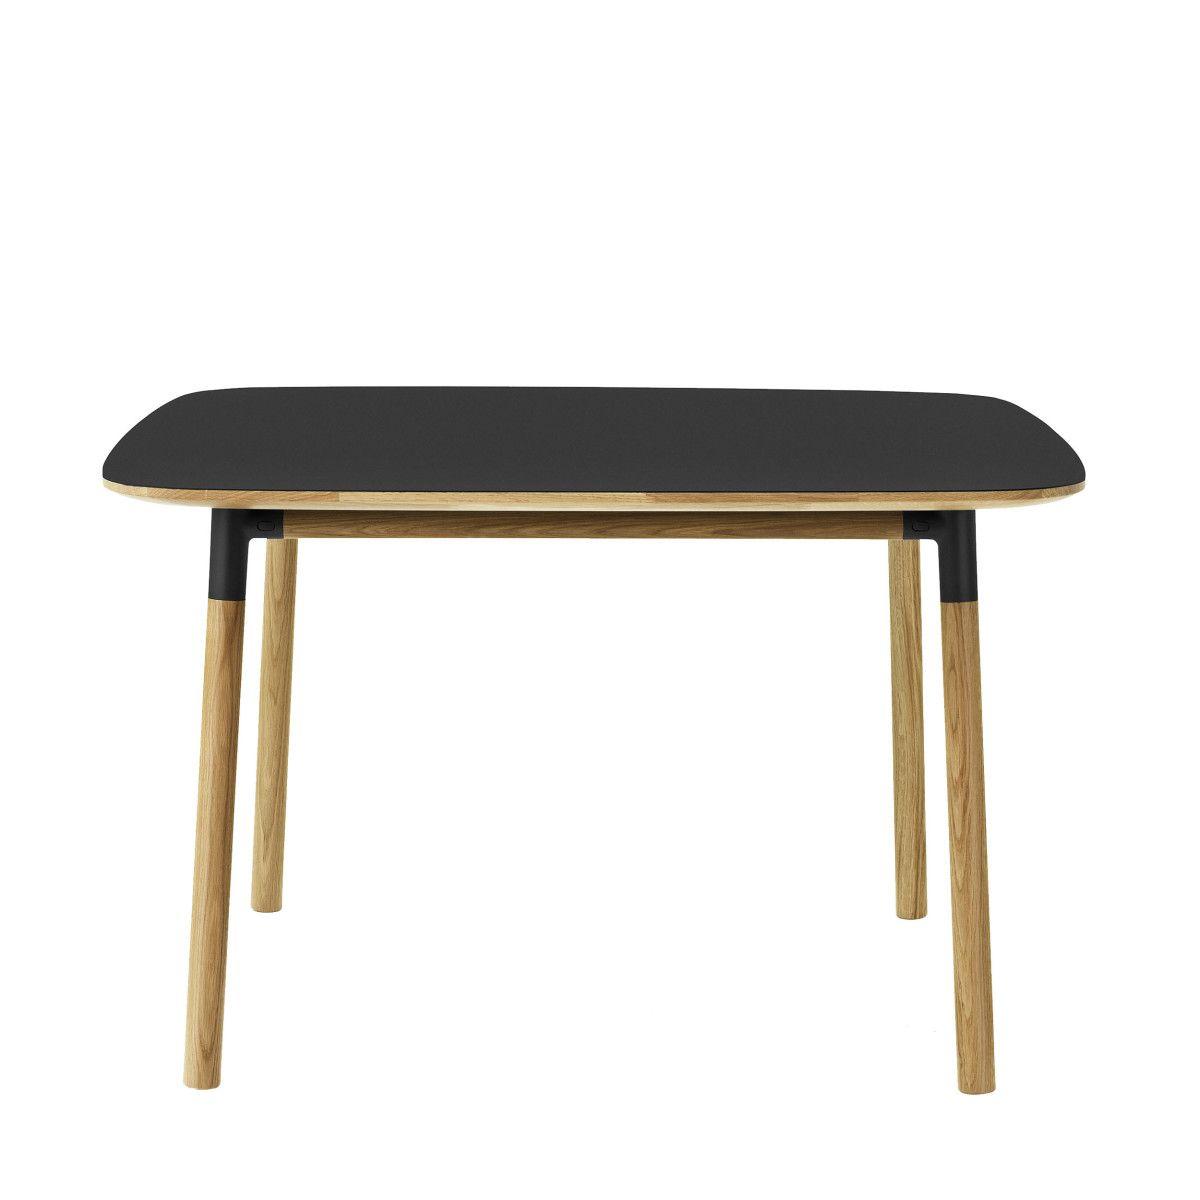 Form Tisch Schwarz 120 Jetzt Bestellen Unter Https Moebel